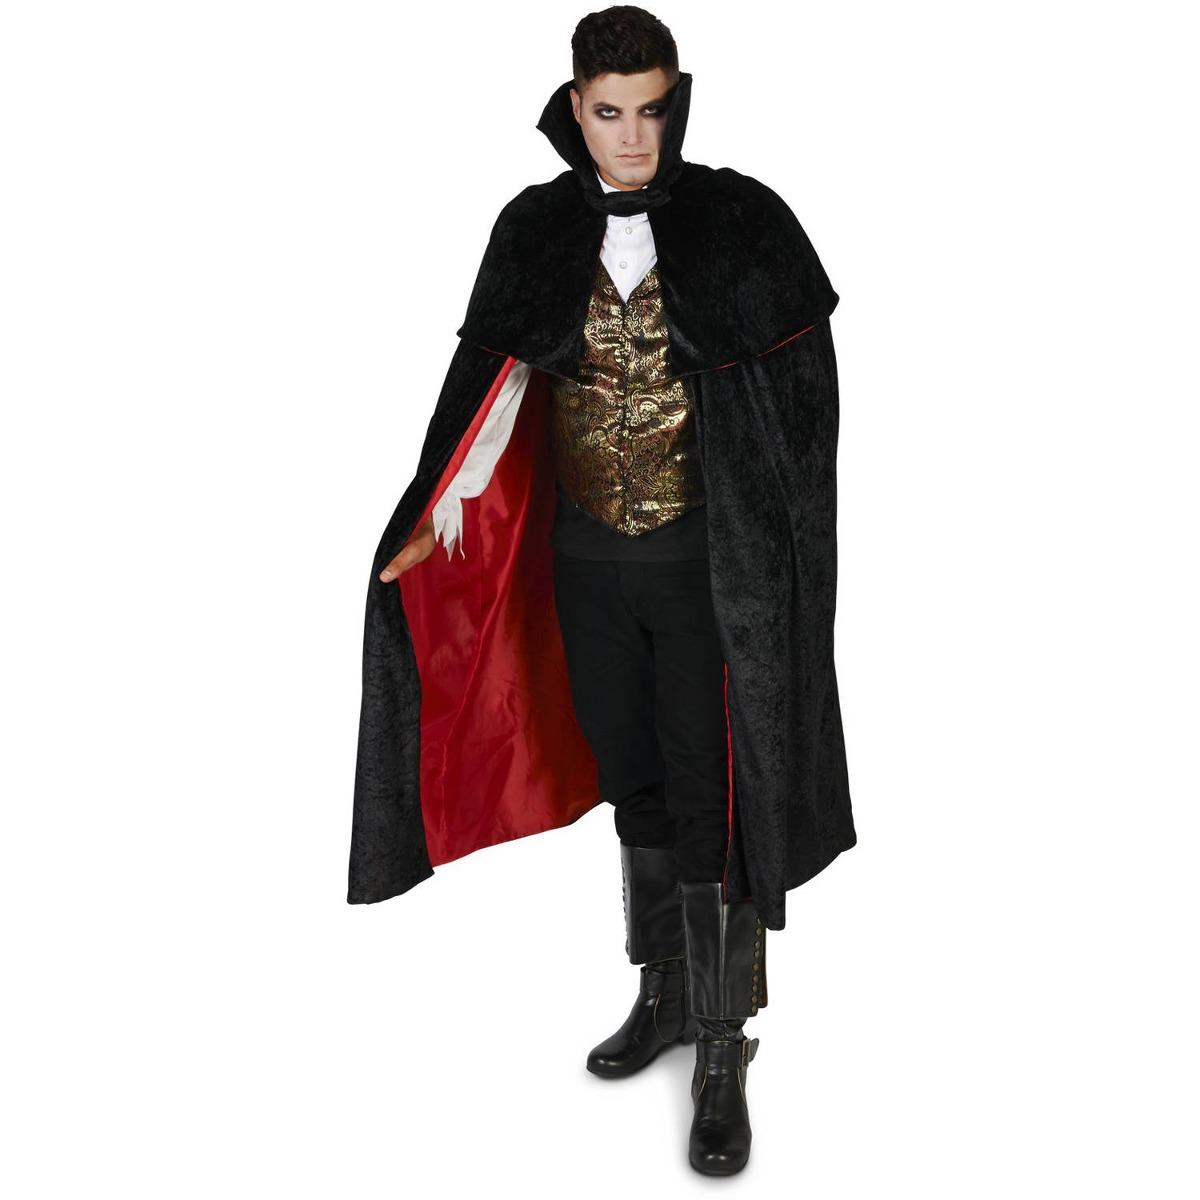 Disfraz De Vampiro Terrorifico De Halloween Para Hombre 348687 - Disfraz-de-halloween-para-hombre